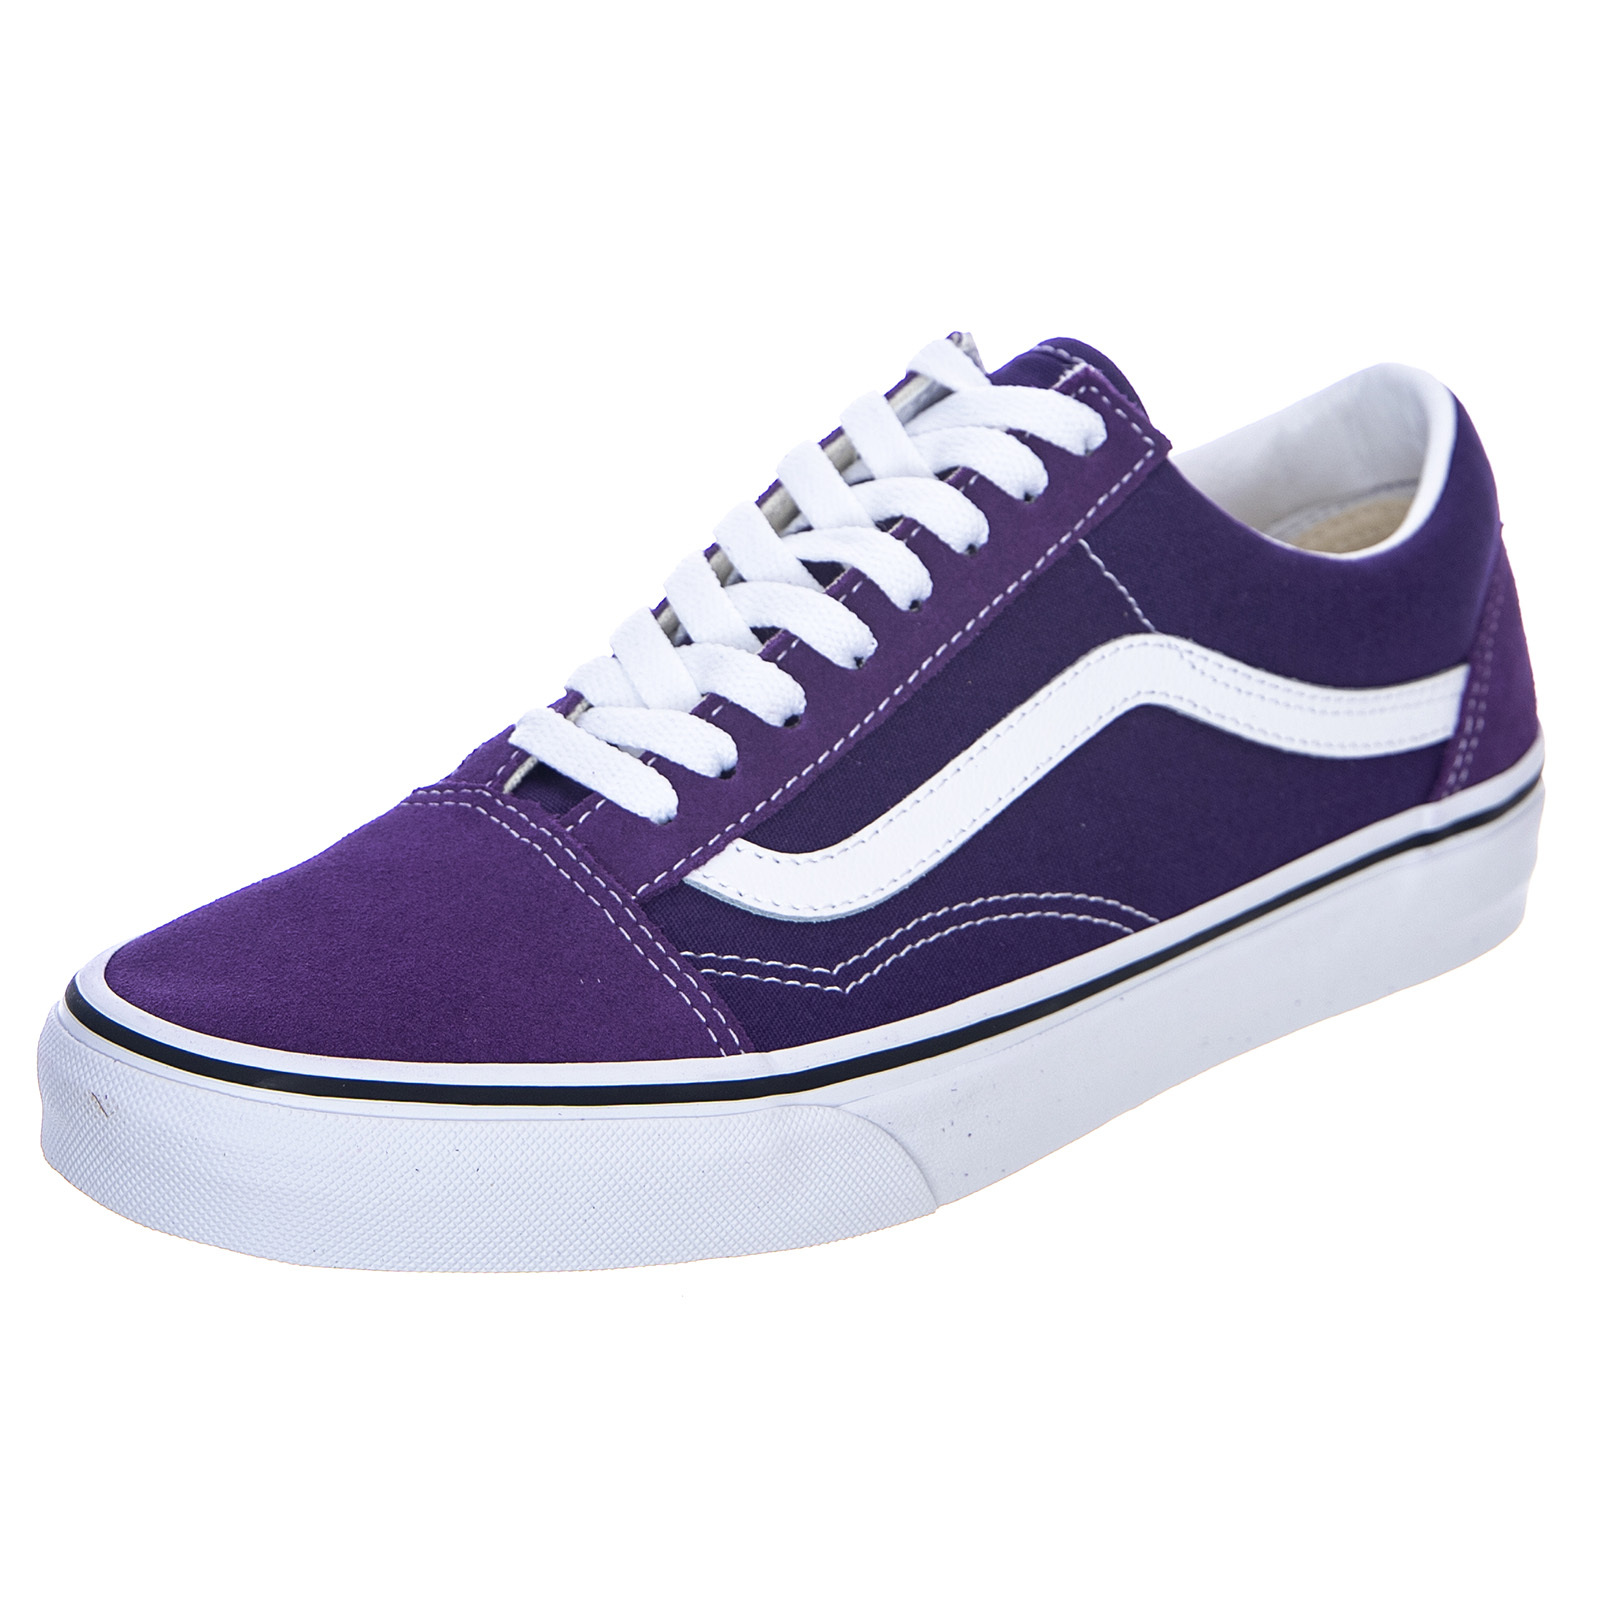 Dettagli su Vans Ua Old Skool Violet Indigo Sneakers Basse Uomo Viola